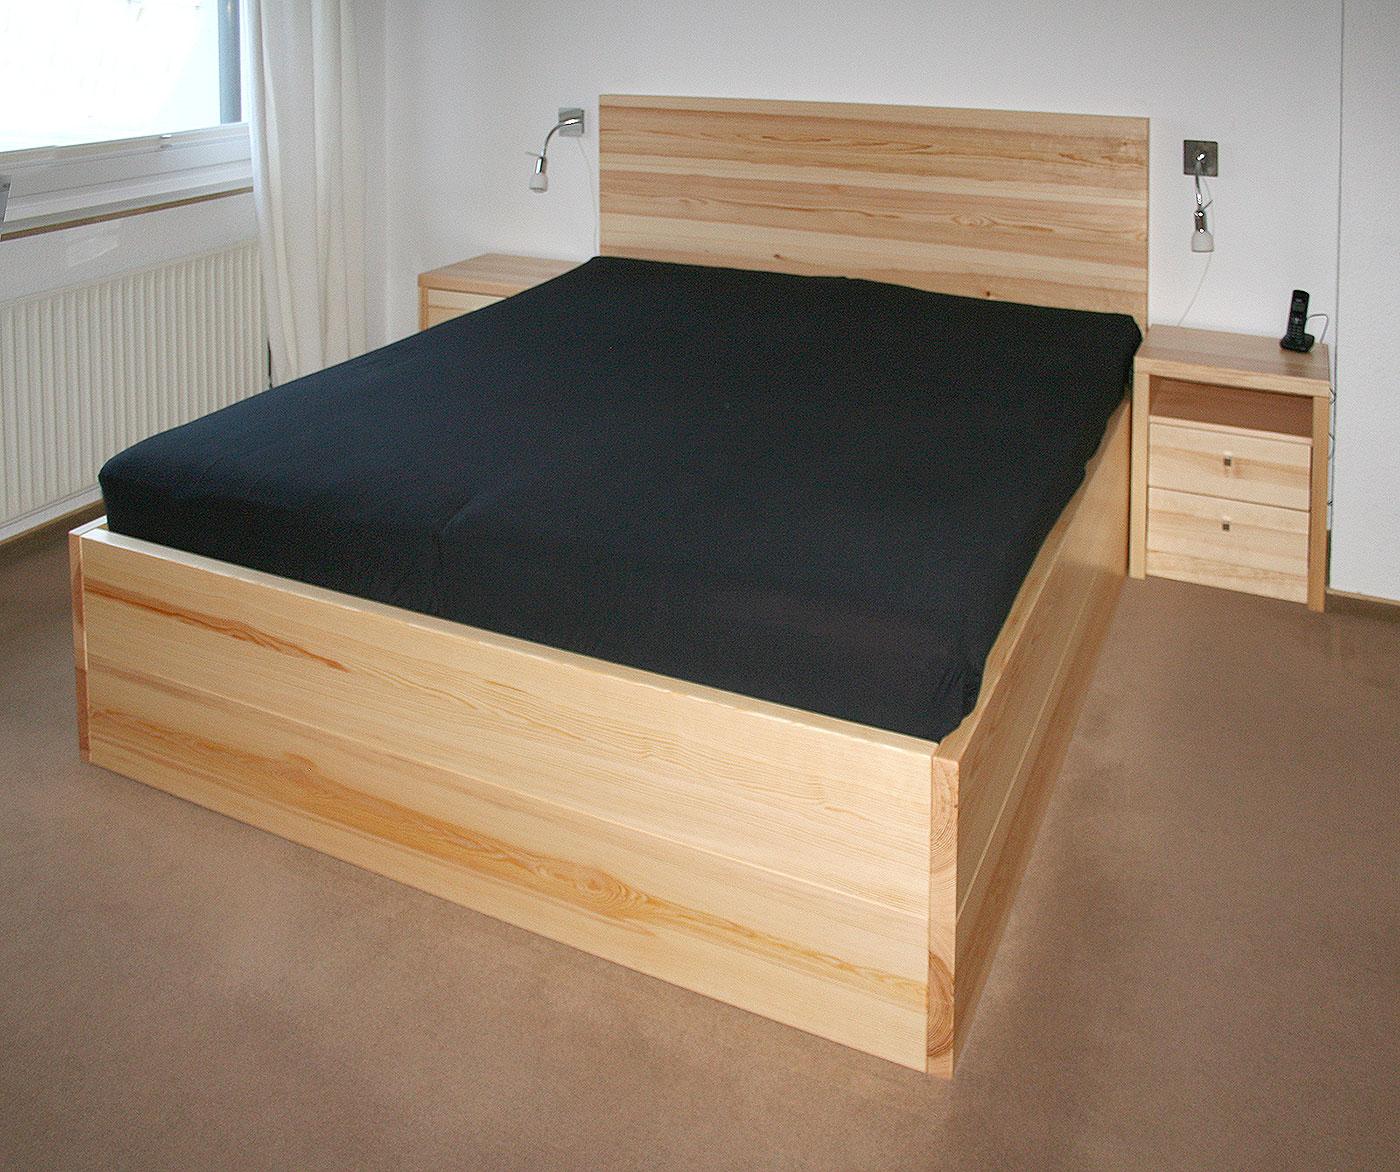 Bett aus Kiefernholz